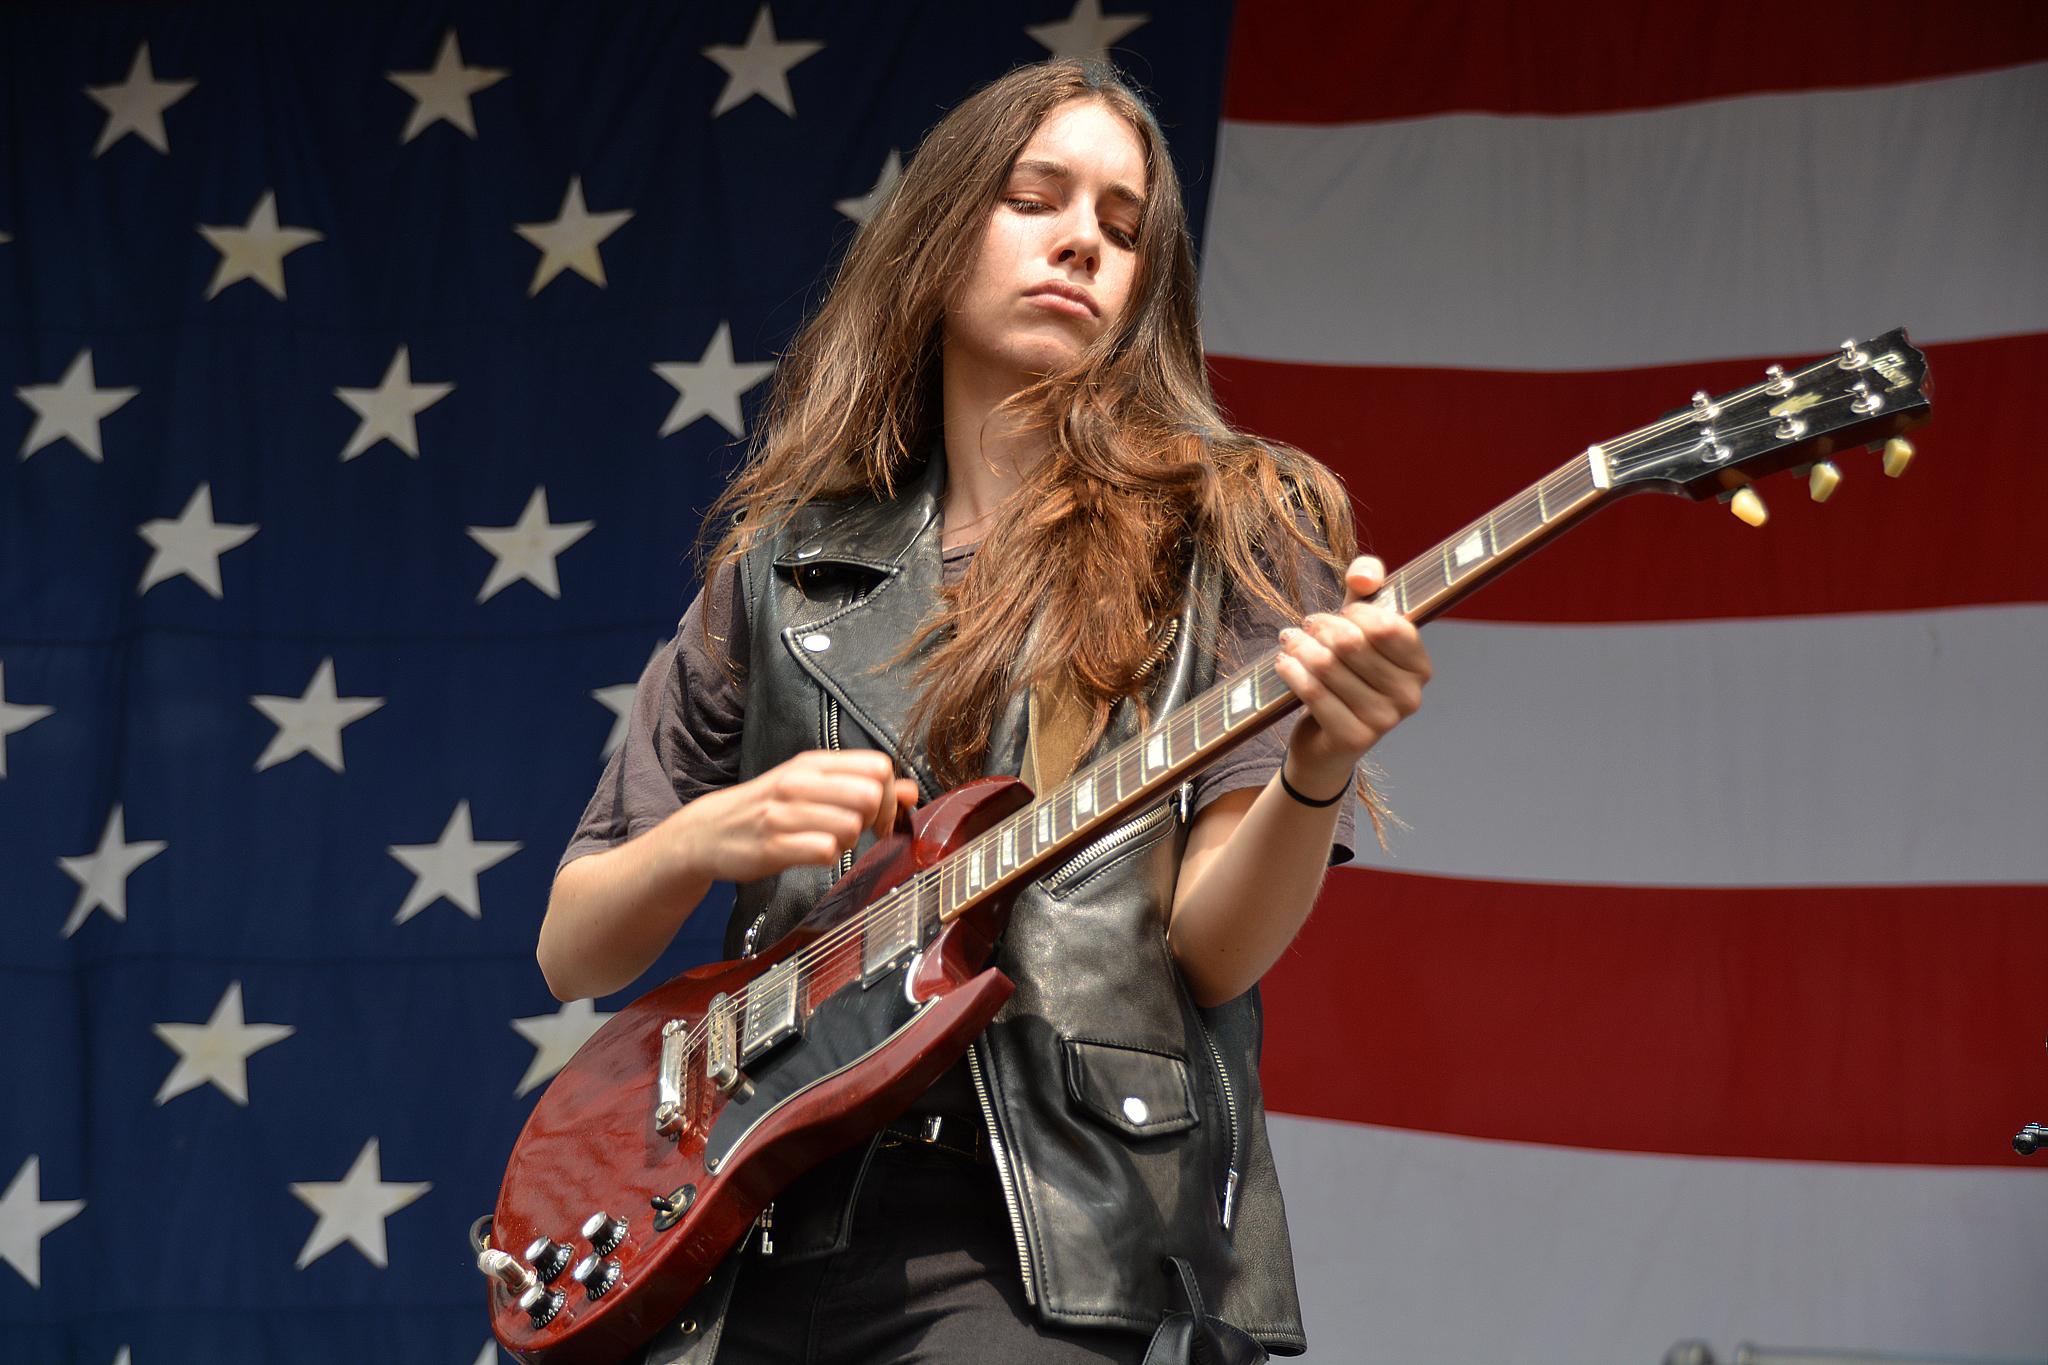 Made in America Festival 2013